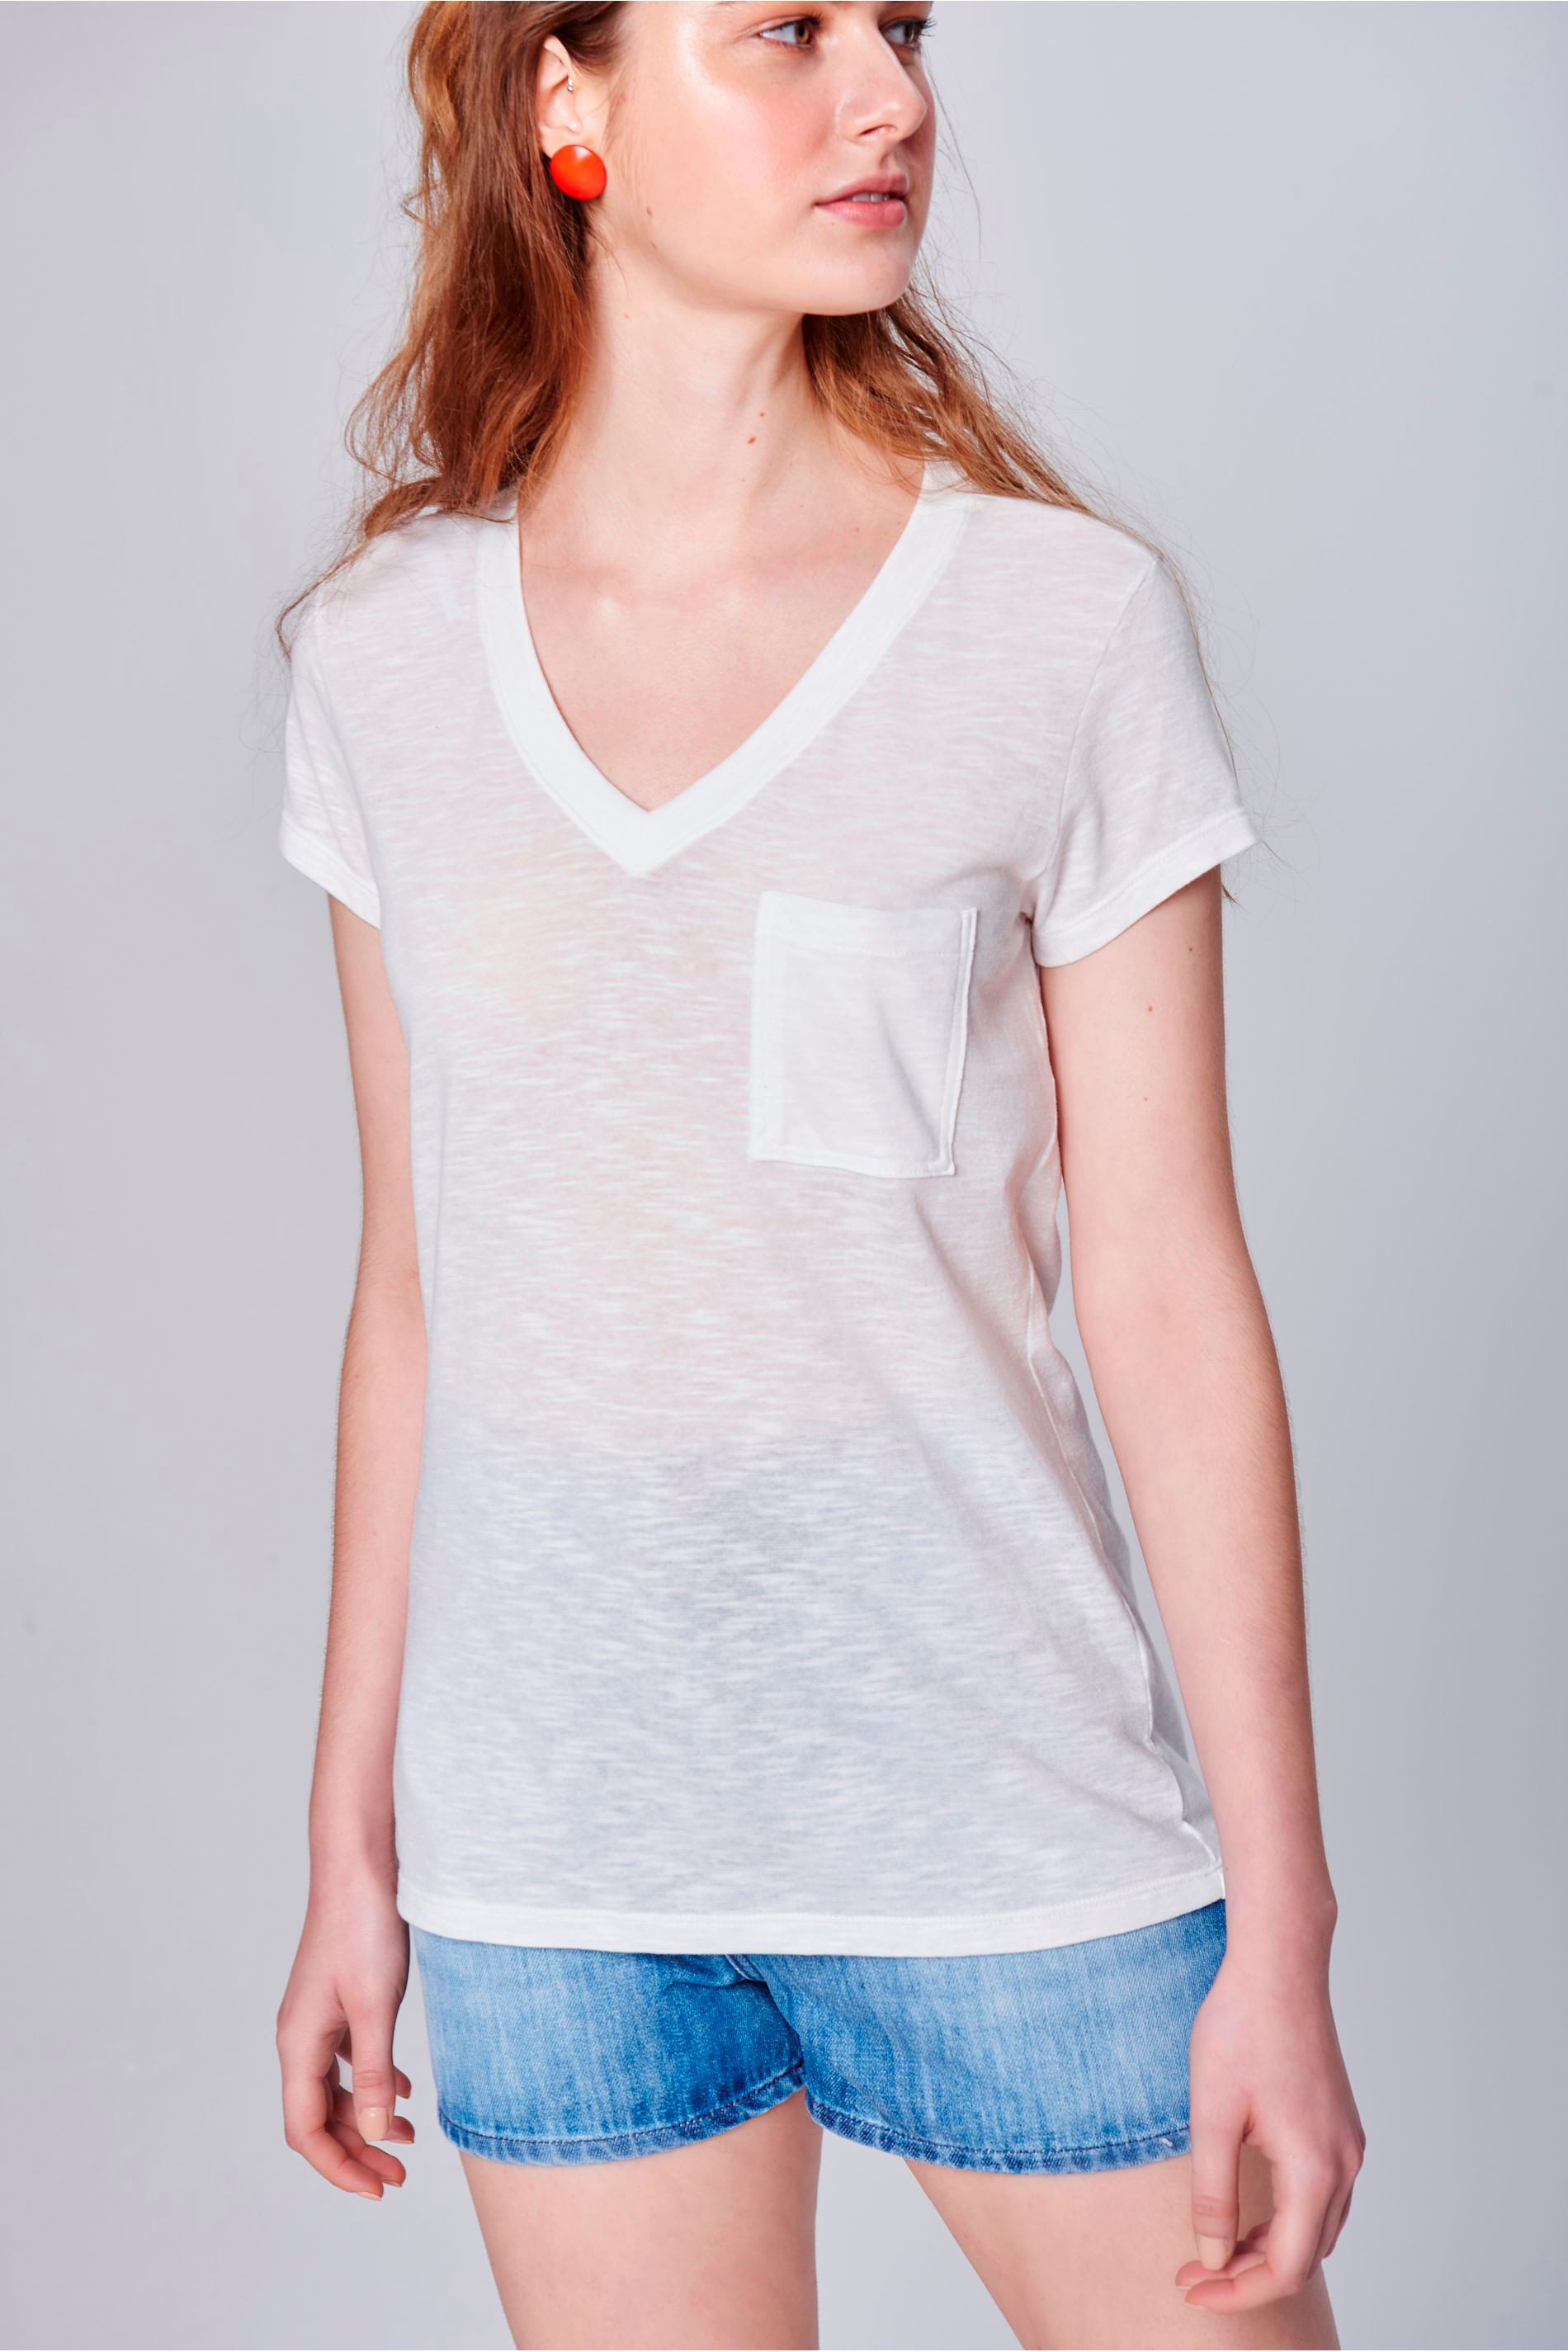 Camiseta Feminina Branca com Bolso - Damyller 26e5281c809ab